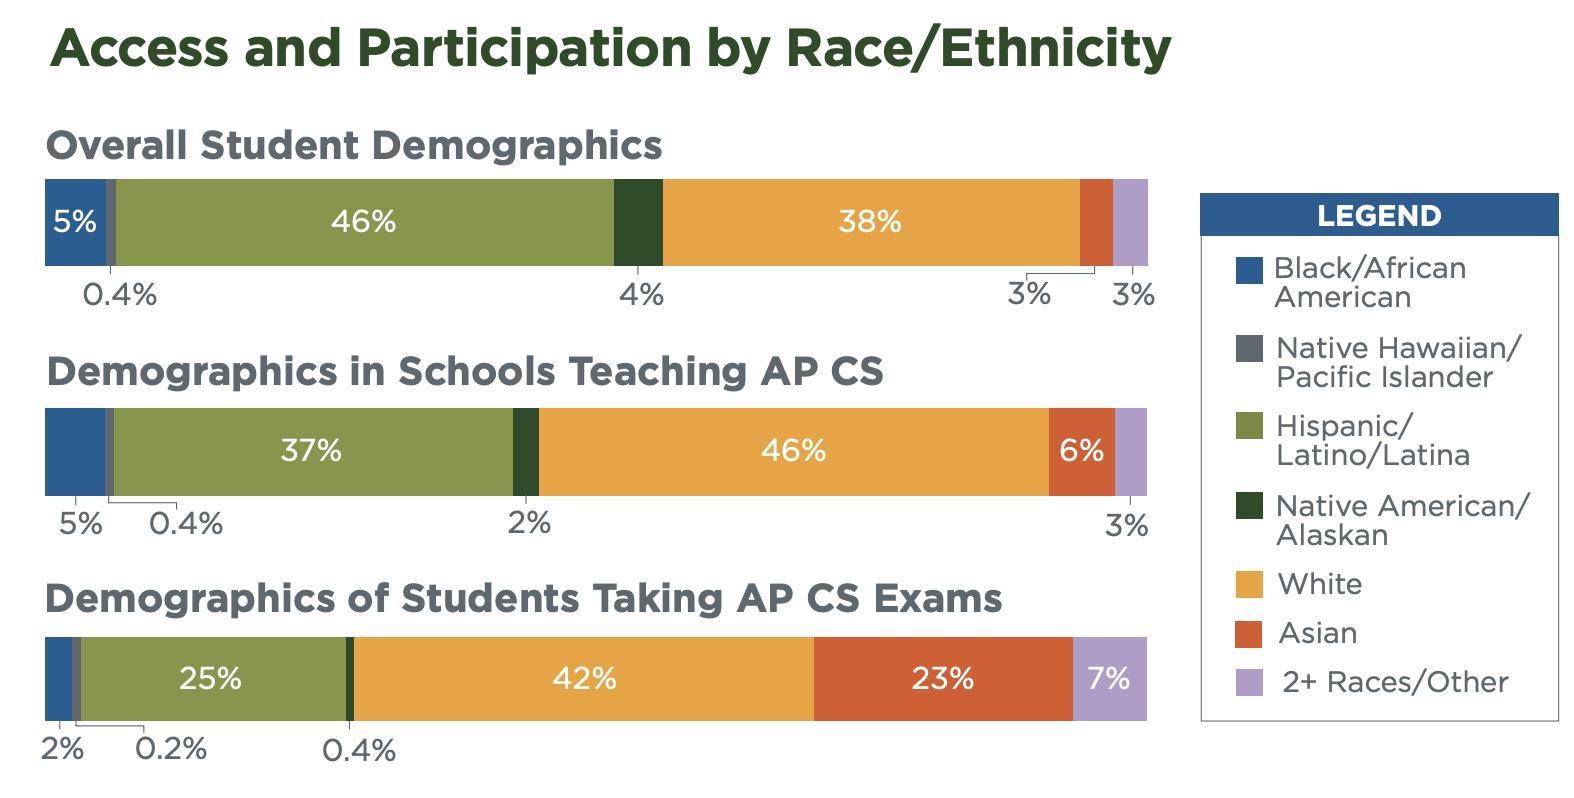 Access & Participation by Race/Ethnicity